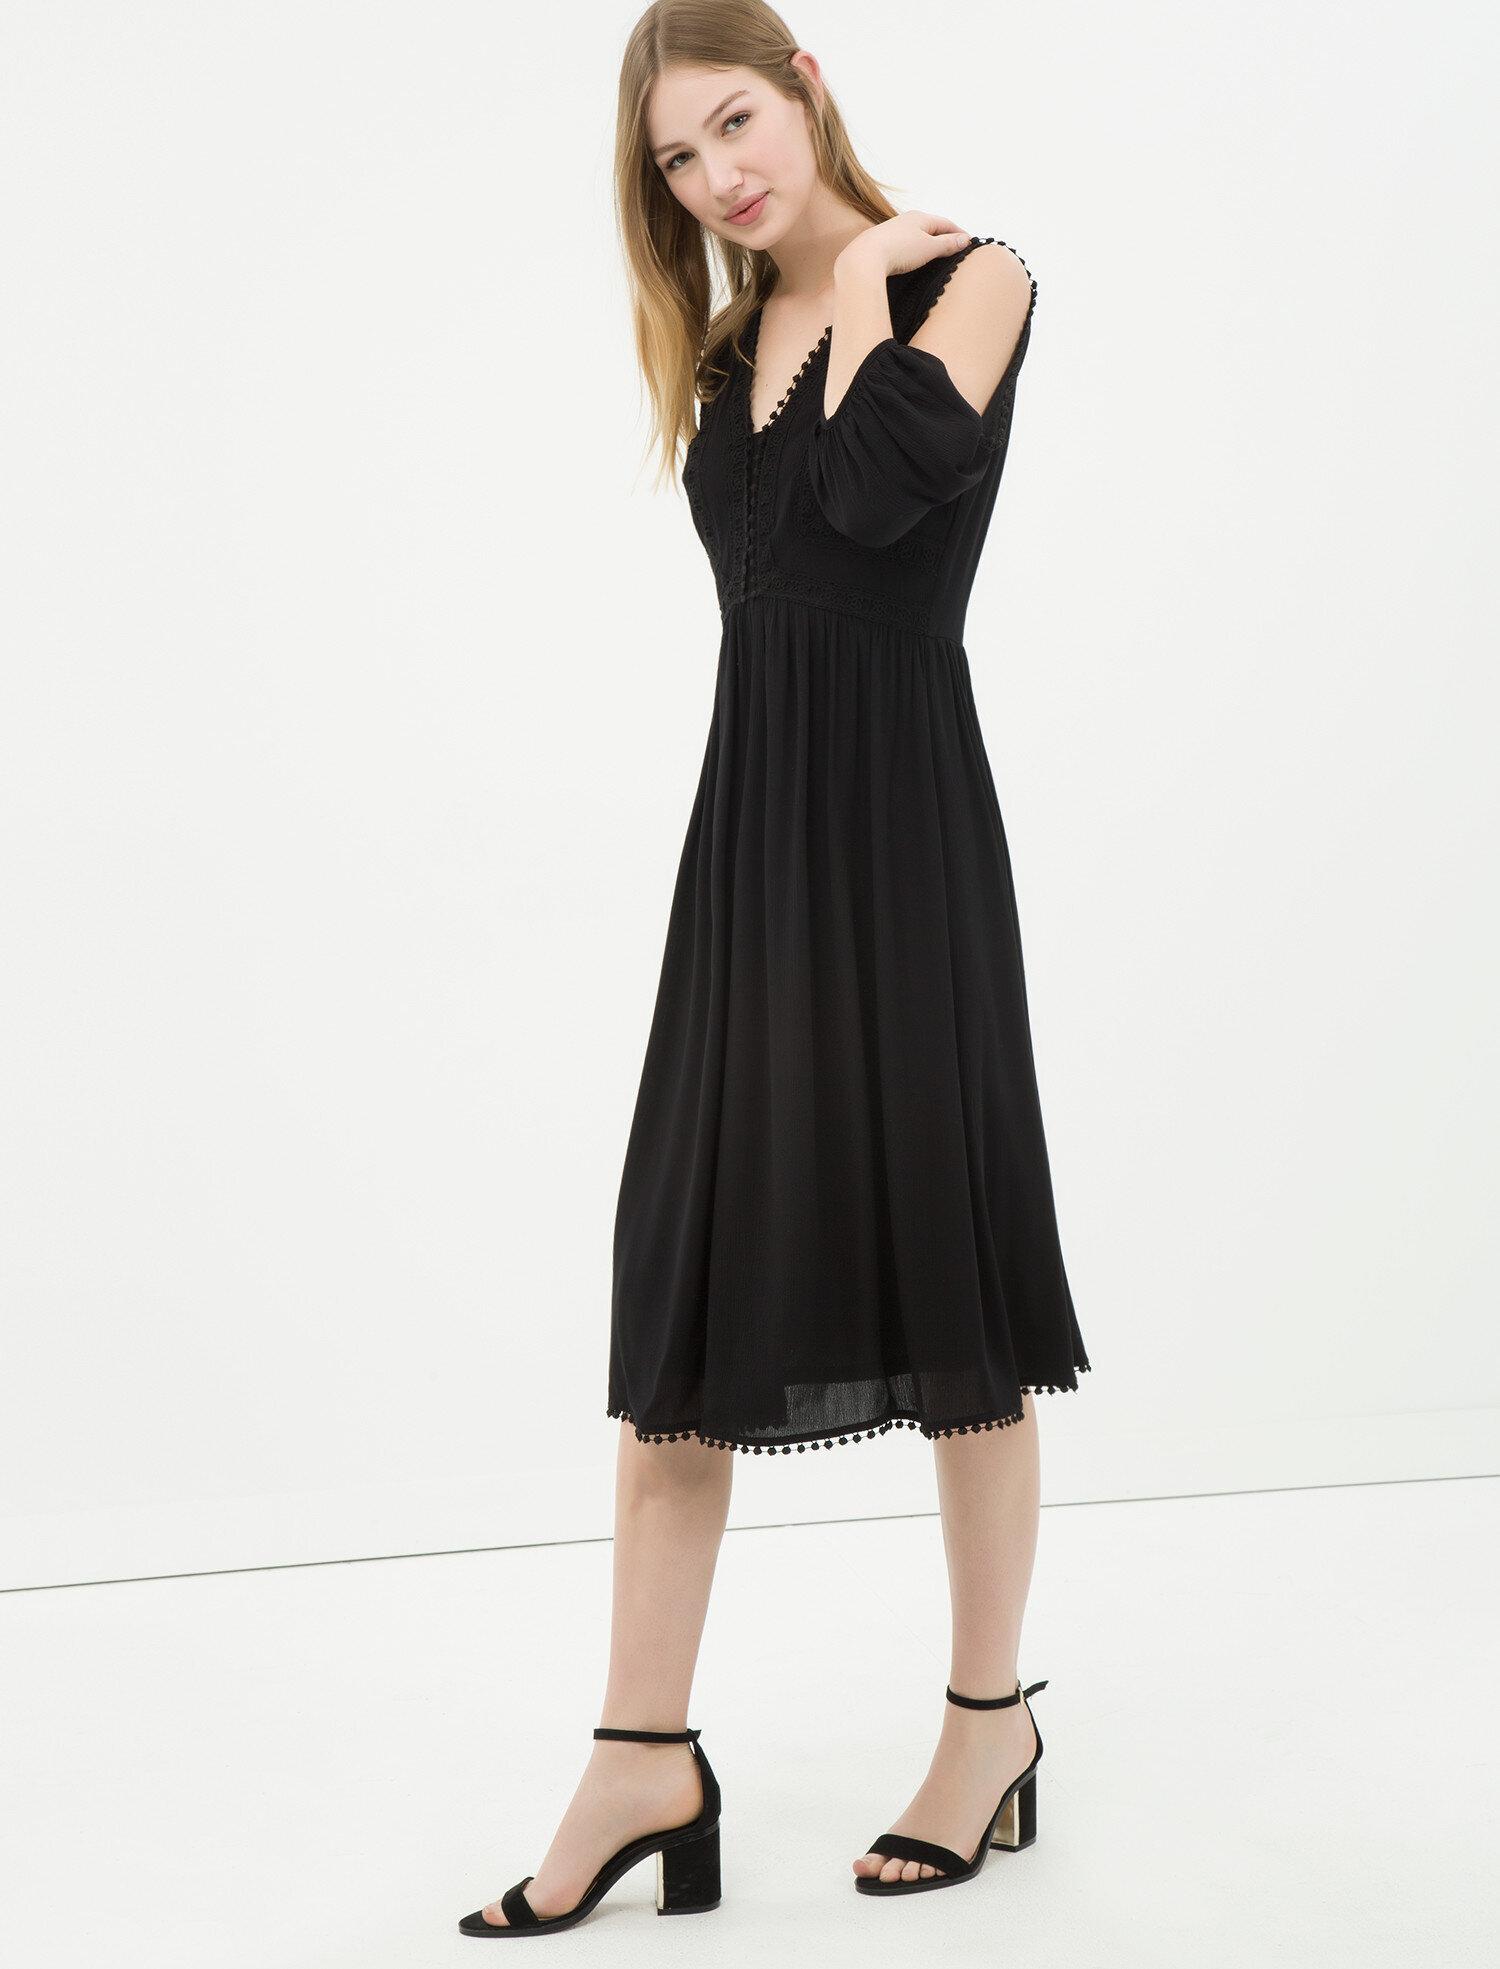 78cadb4fd44fc Siyah Bayan Omuz Detaylı Elbise 6YAK88848PW999 | Koton